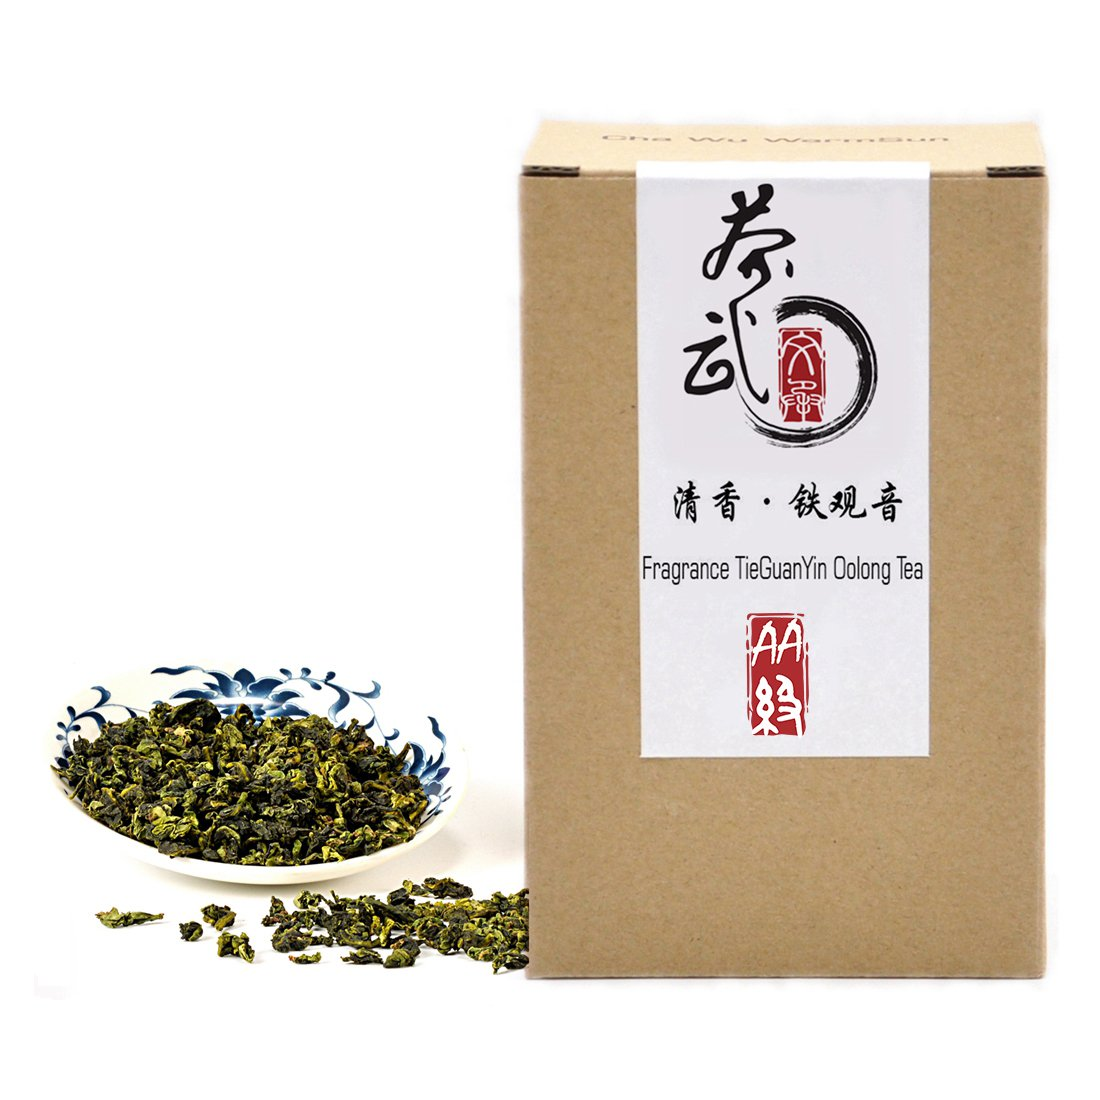 Cha Wu-[AA] Fragrant TieGuanYin Oolong Tea,8.8oz/250g,WuLong Tea Loose Leaf Wu Long,Origin of AnXi,FuJian,Chinese by ChaWuWarmSun